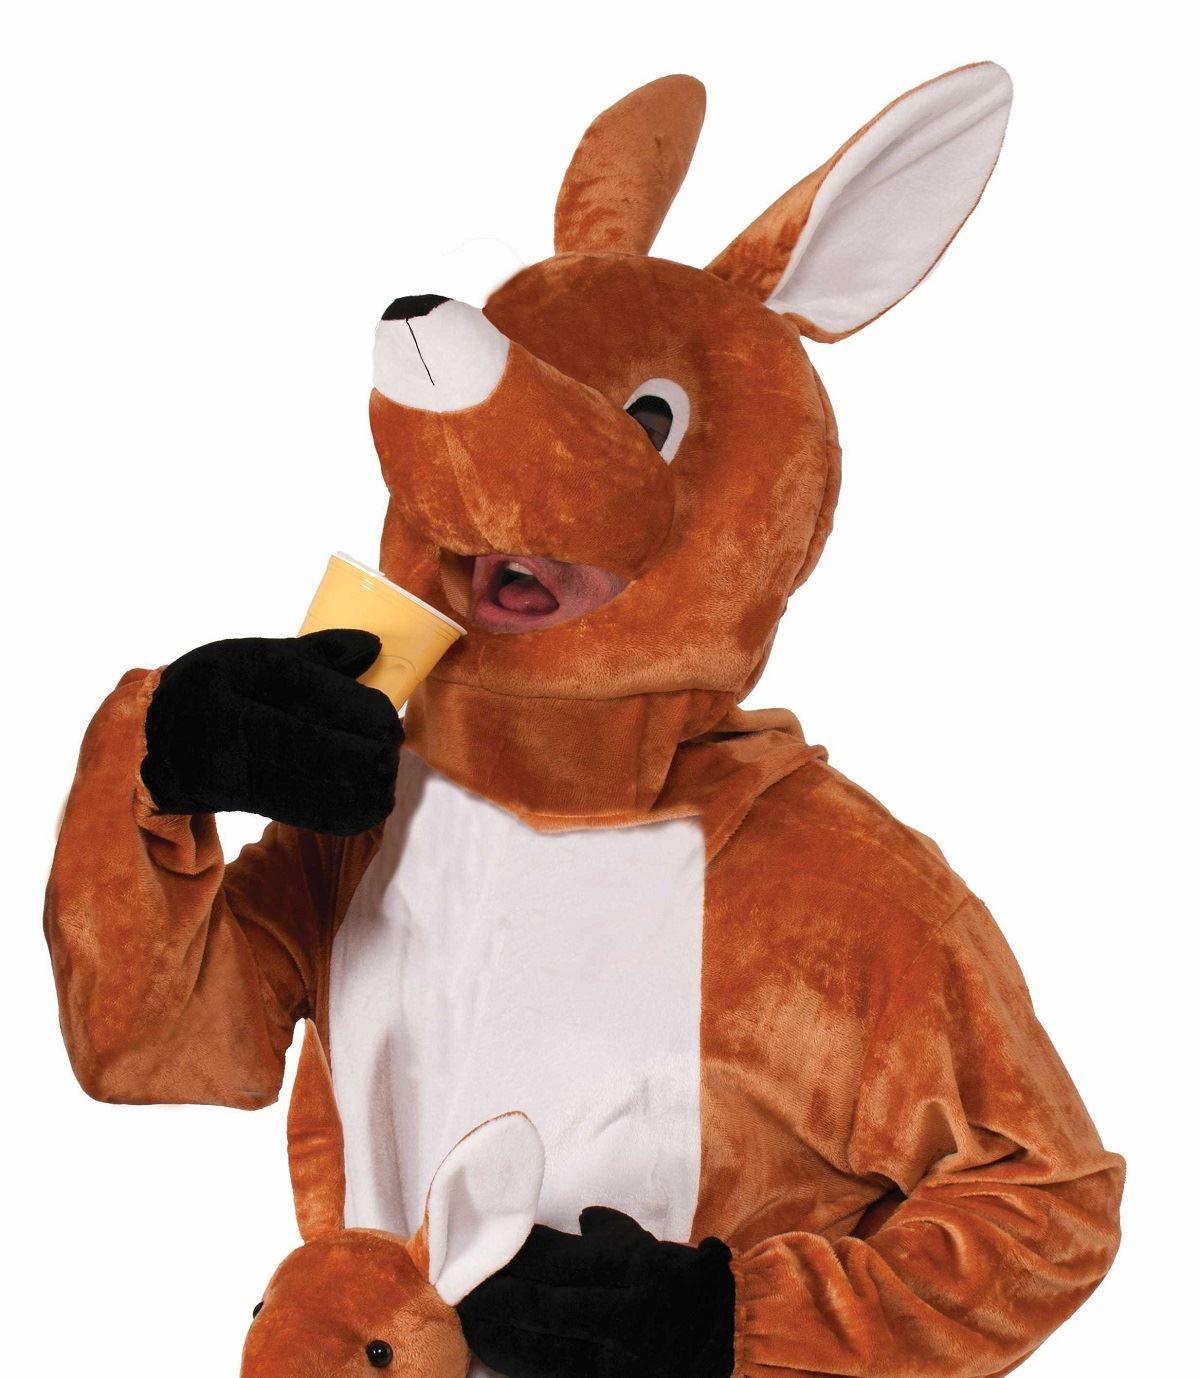 ... Adult Jumpin Jenny The Kangaroo Mascot Costume  sc 1 st  The Costume Land & Adult Jumpin Jenny The Kangaroo Mascot Costume | $61.99 | The ...